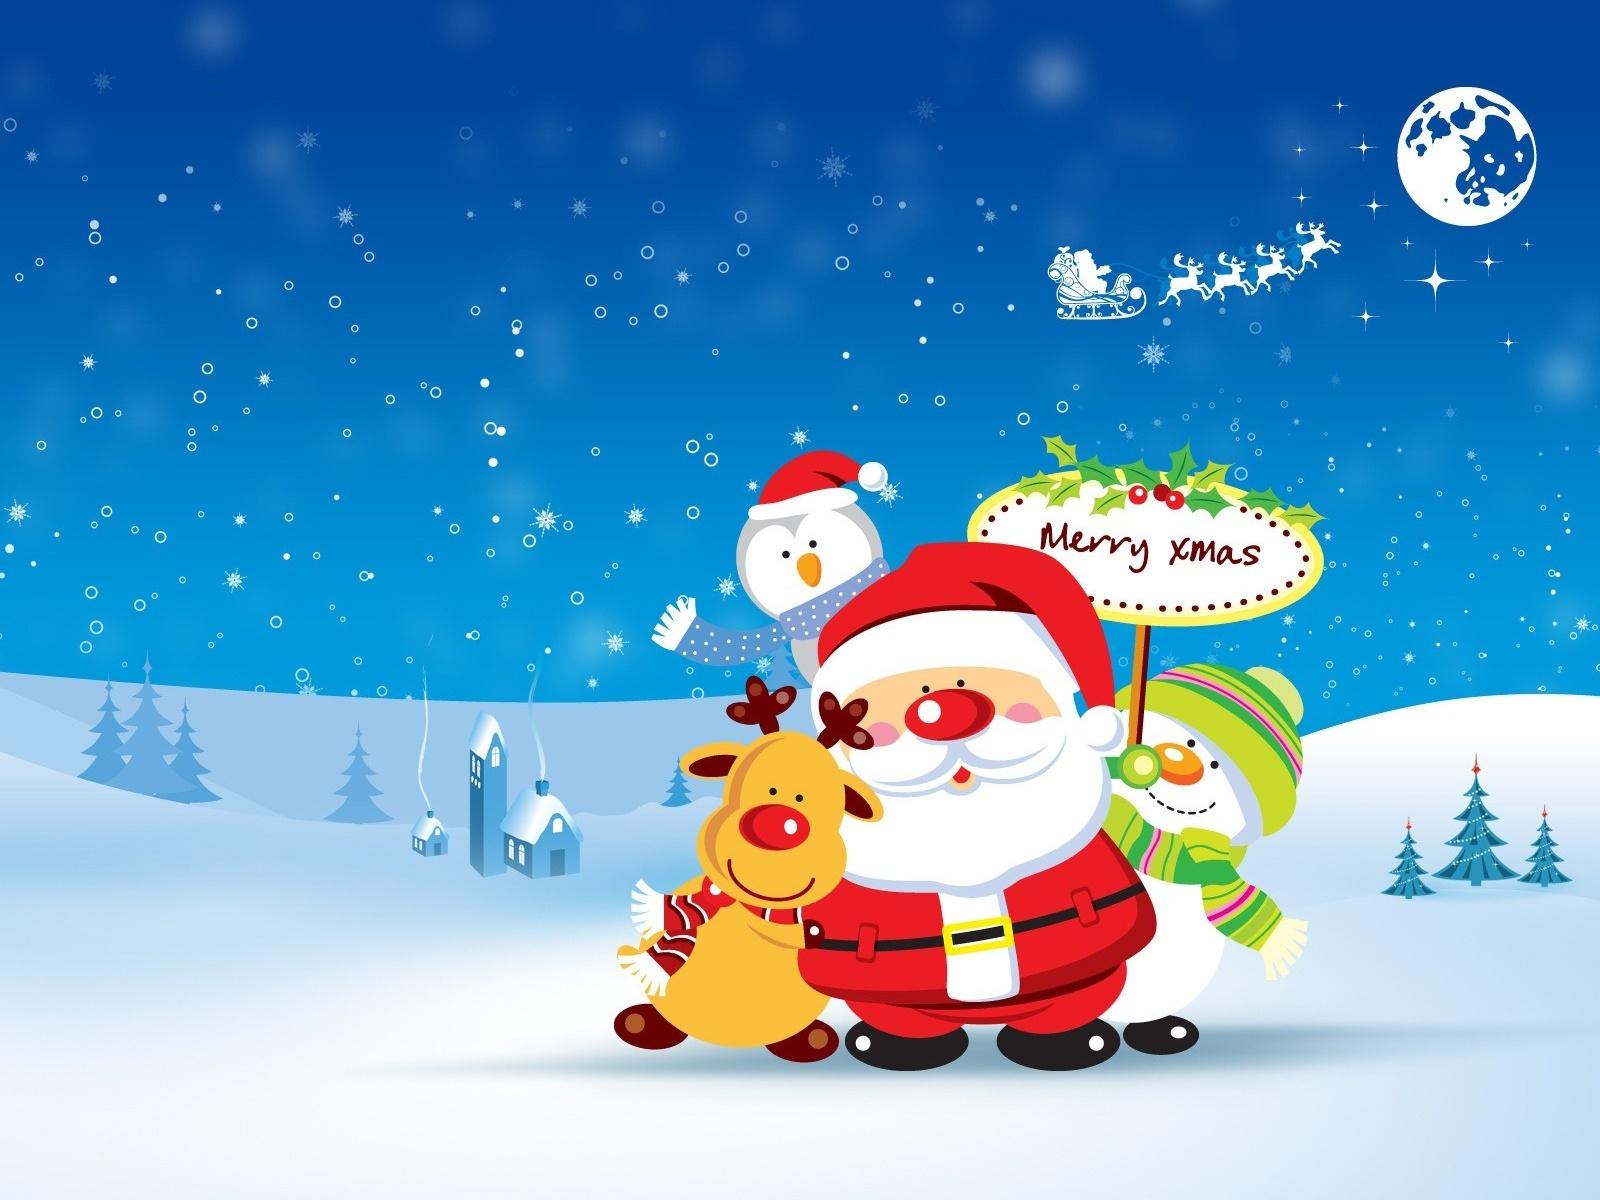 Cute Merry Christmas Wallpaper   HD Wallpapers 1600x1200